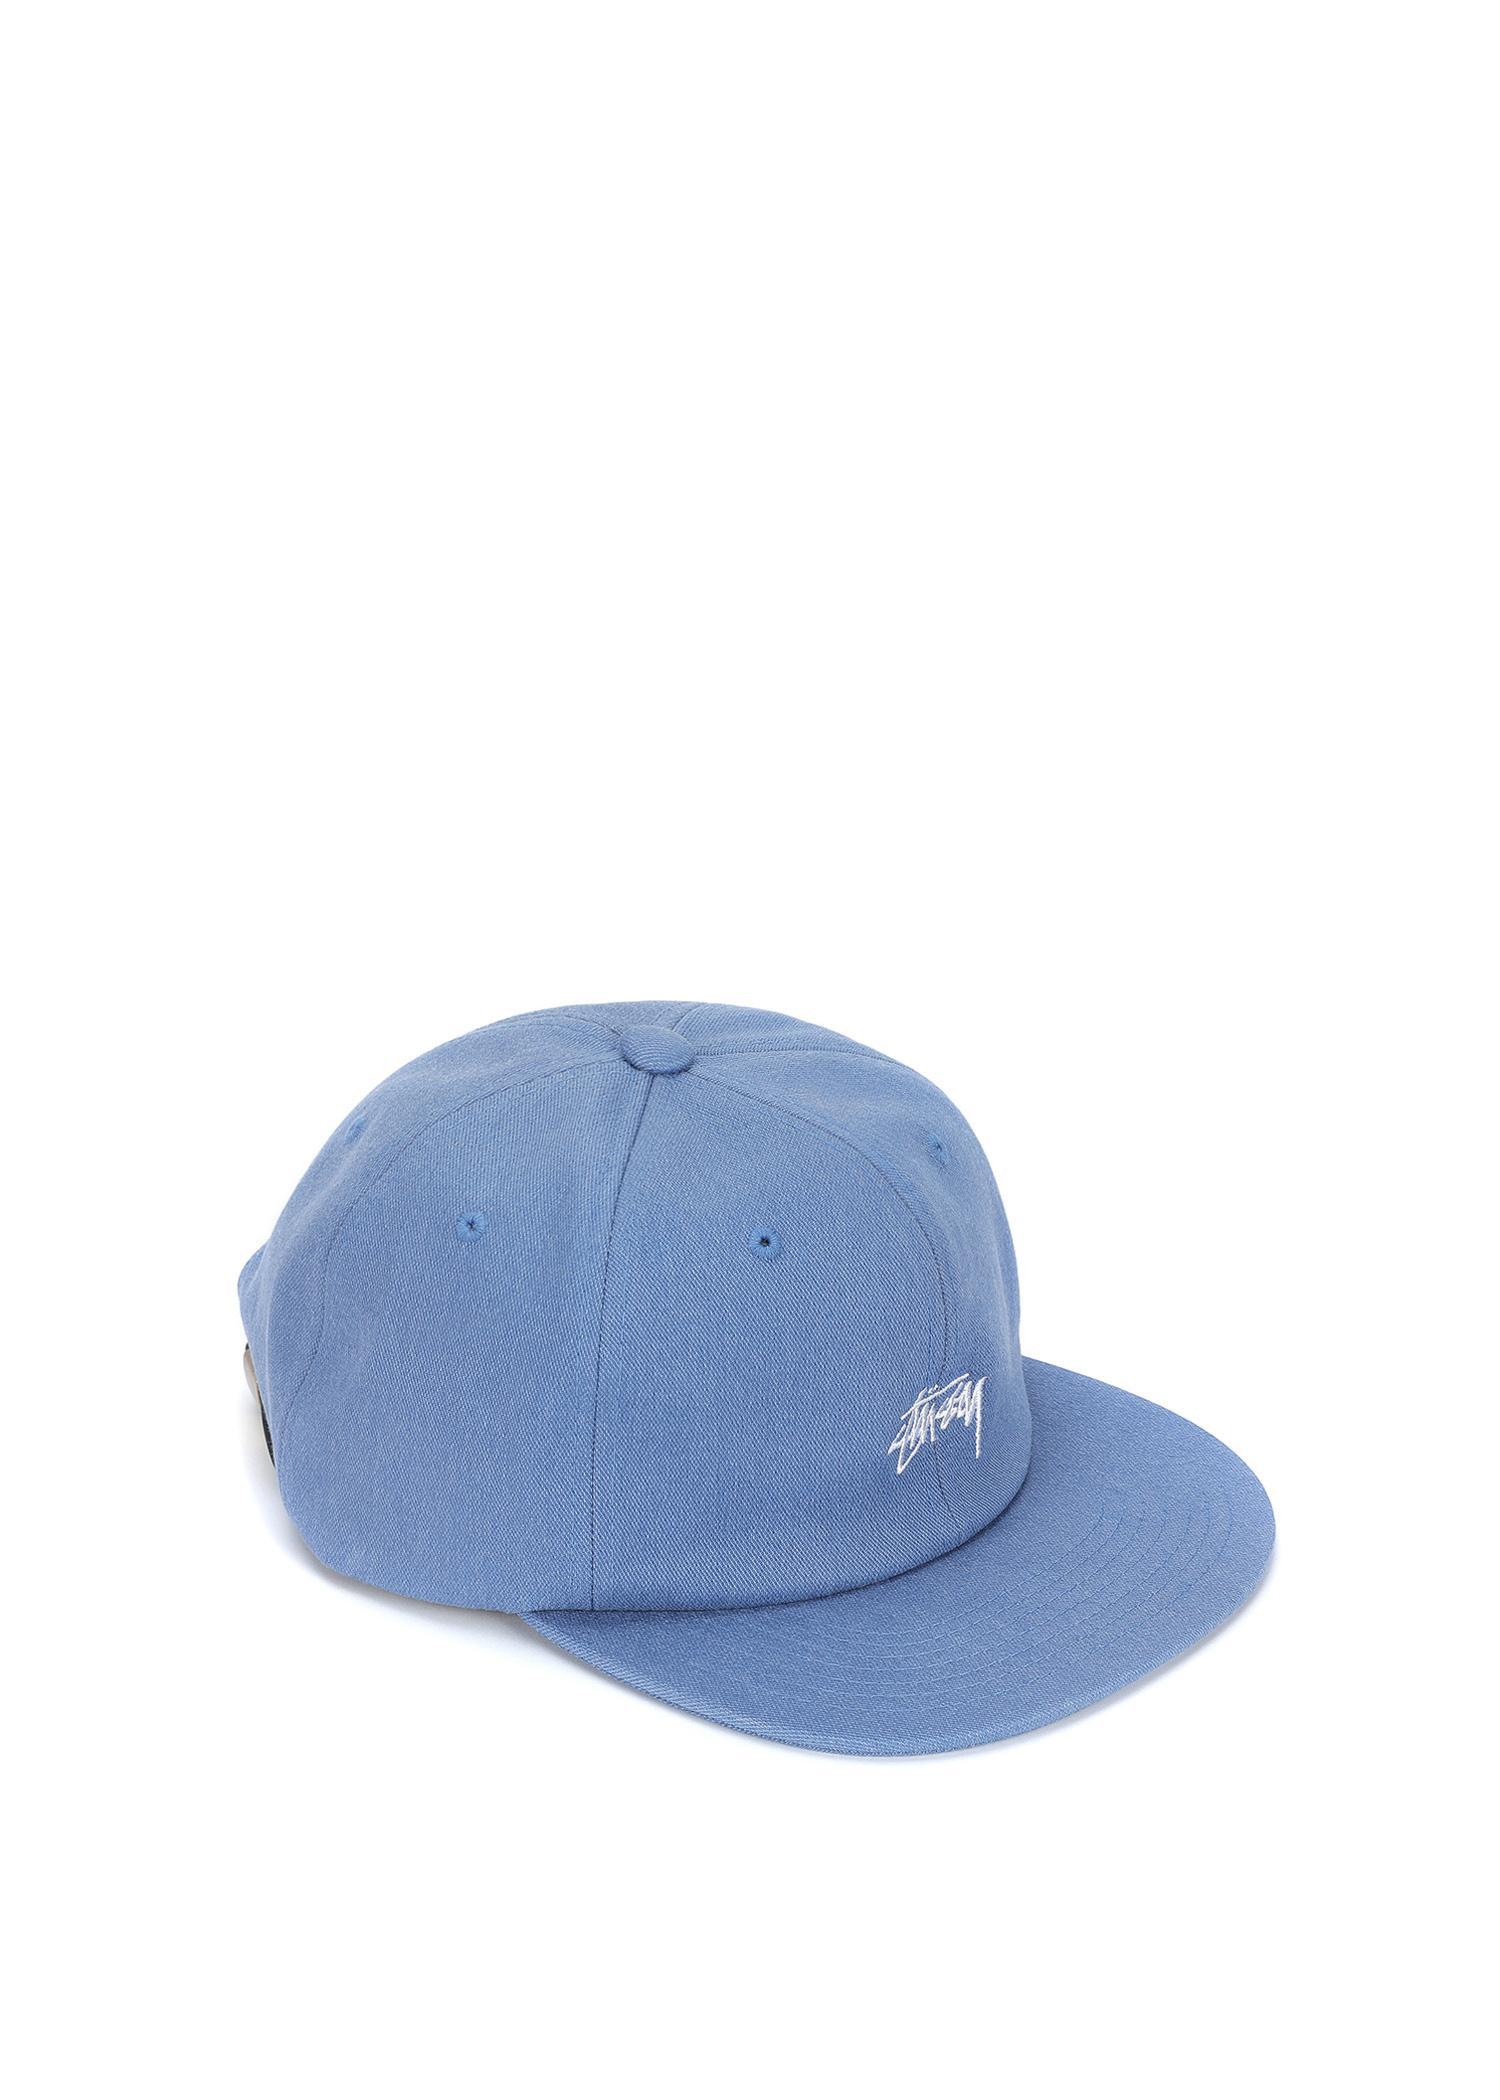 75b8f05925f5f Stussy Melange Denim Strapback Cap In Blue